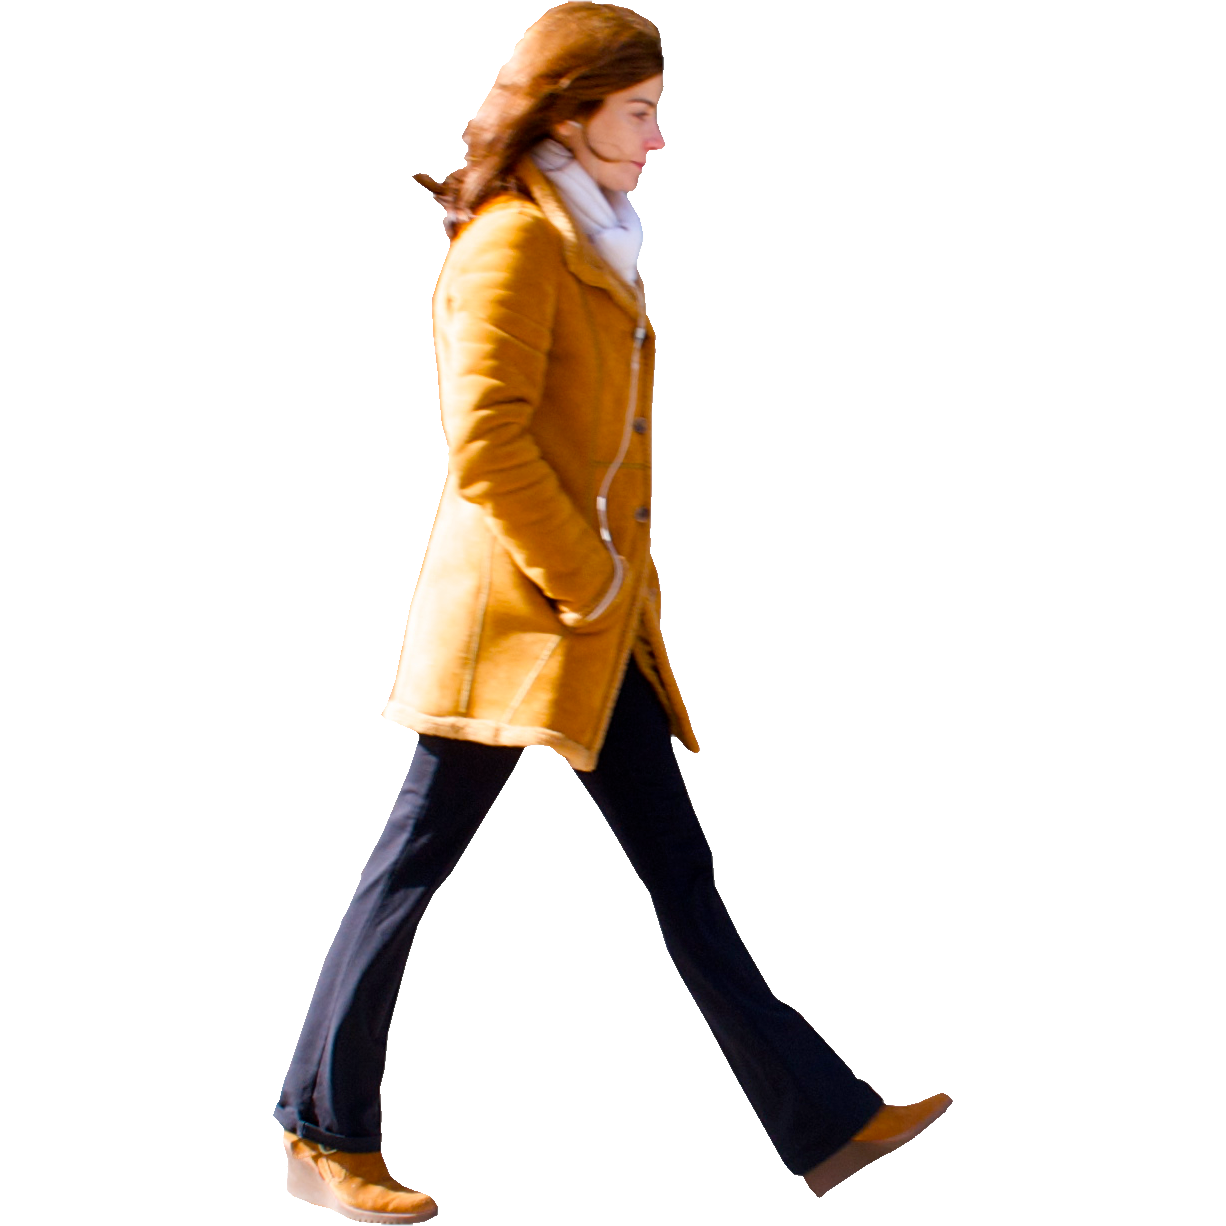 people walking png click to download description cutout